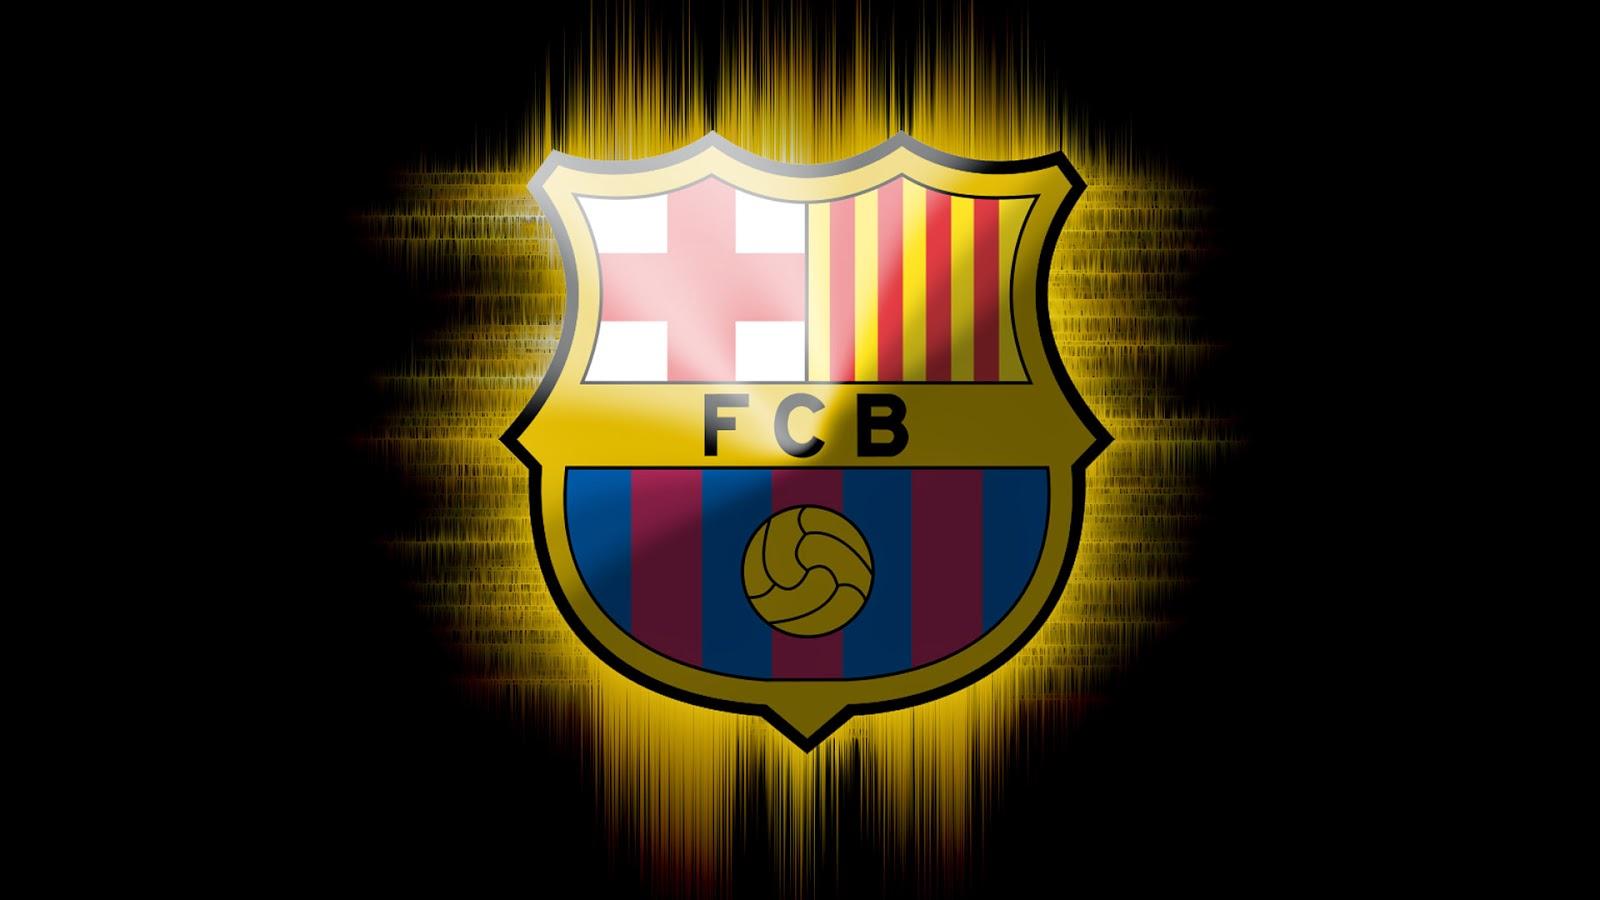 FC Barcelona Logo New HD Wallpaper 2014 | World Fresh HD Wallapers